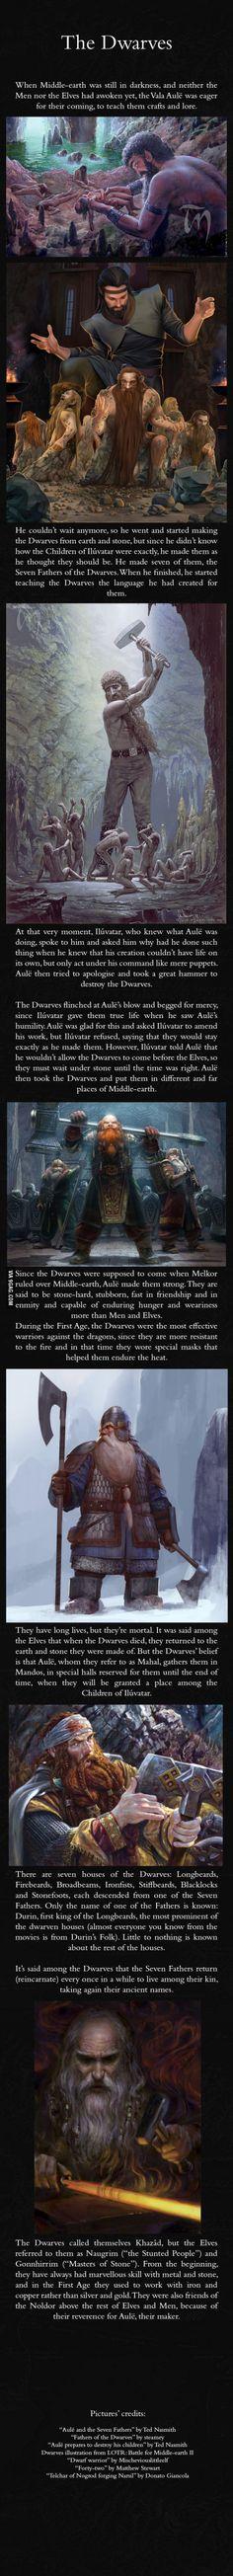 Dwarves - J.R.R. Tolkien's Mythology. So much info in such little space!